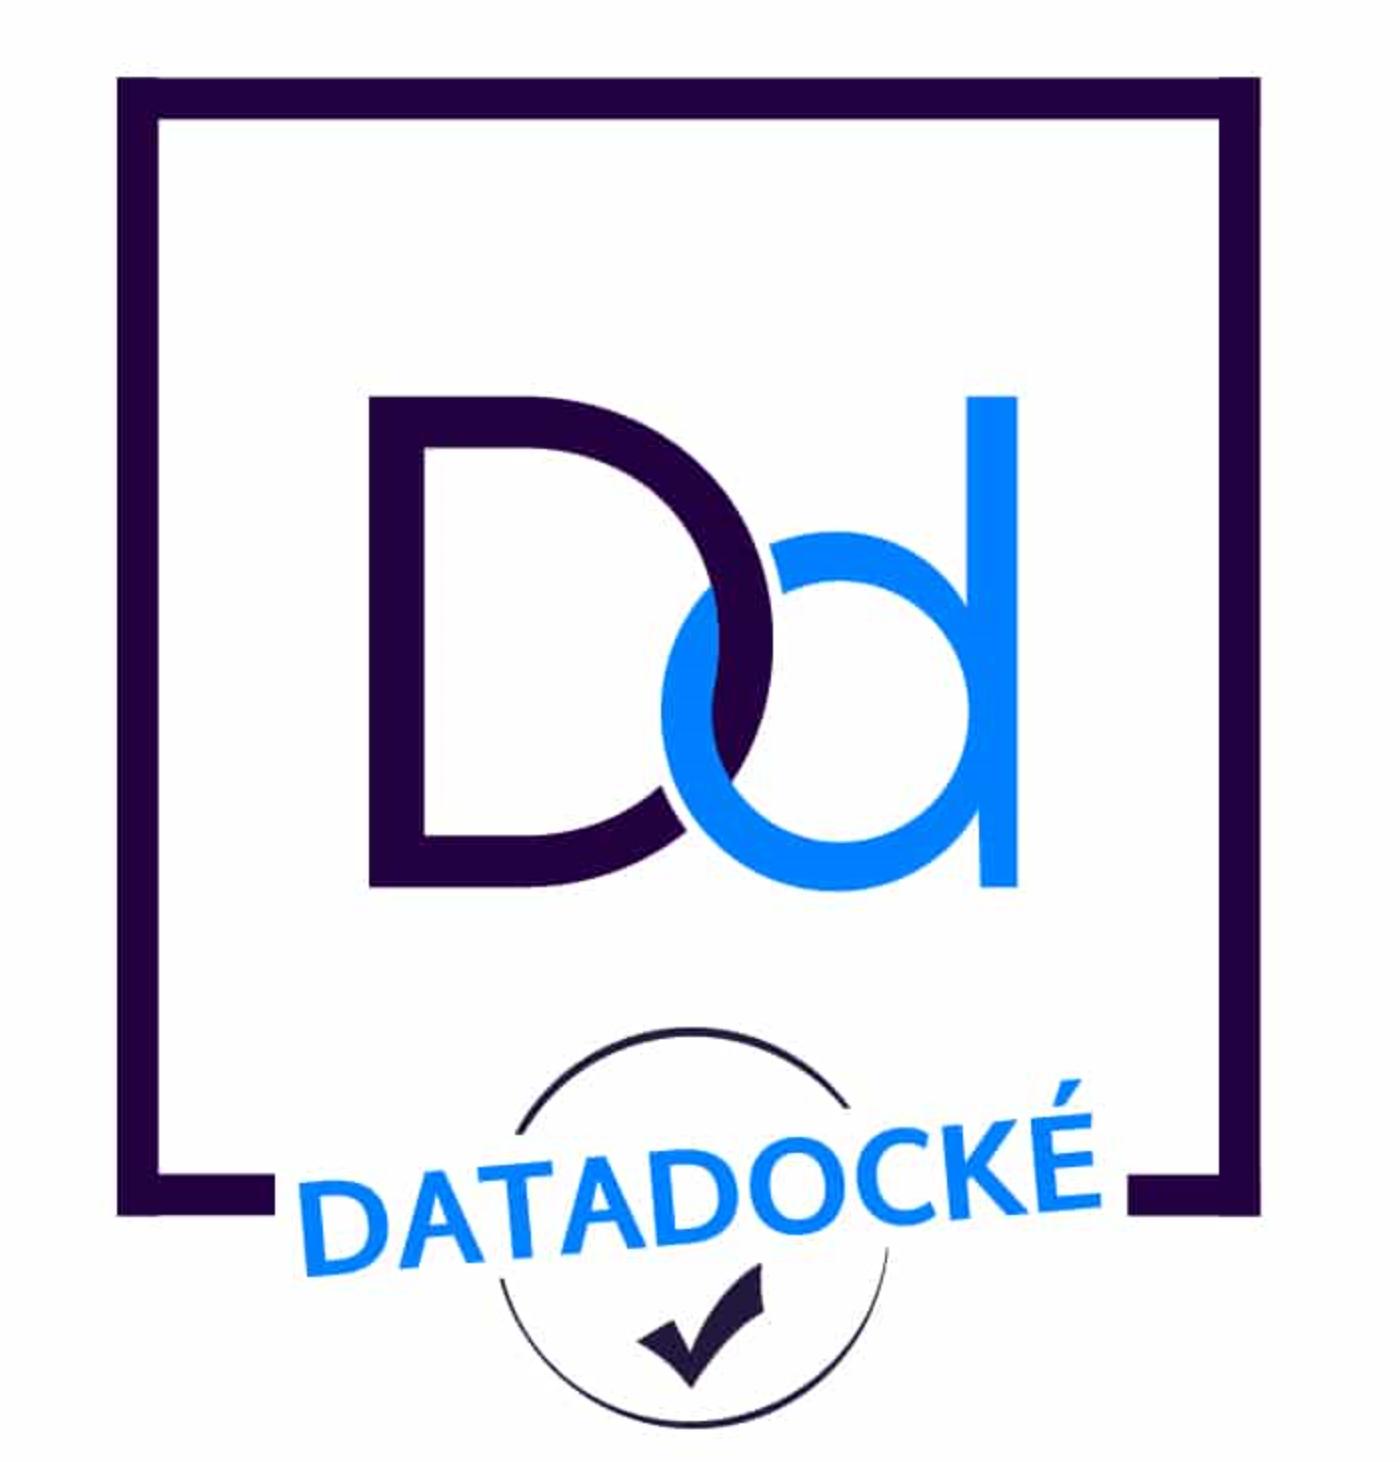 Datadock MLDH